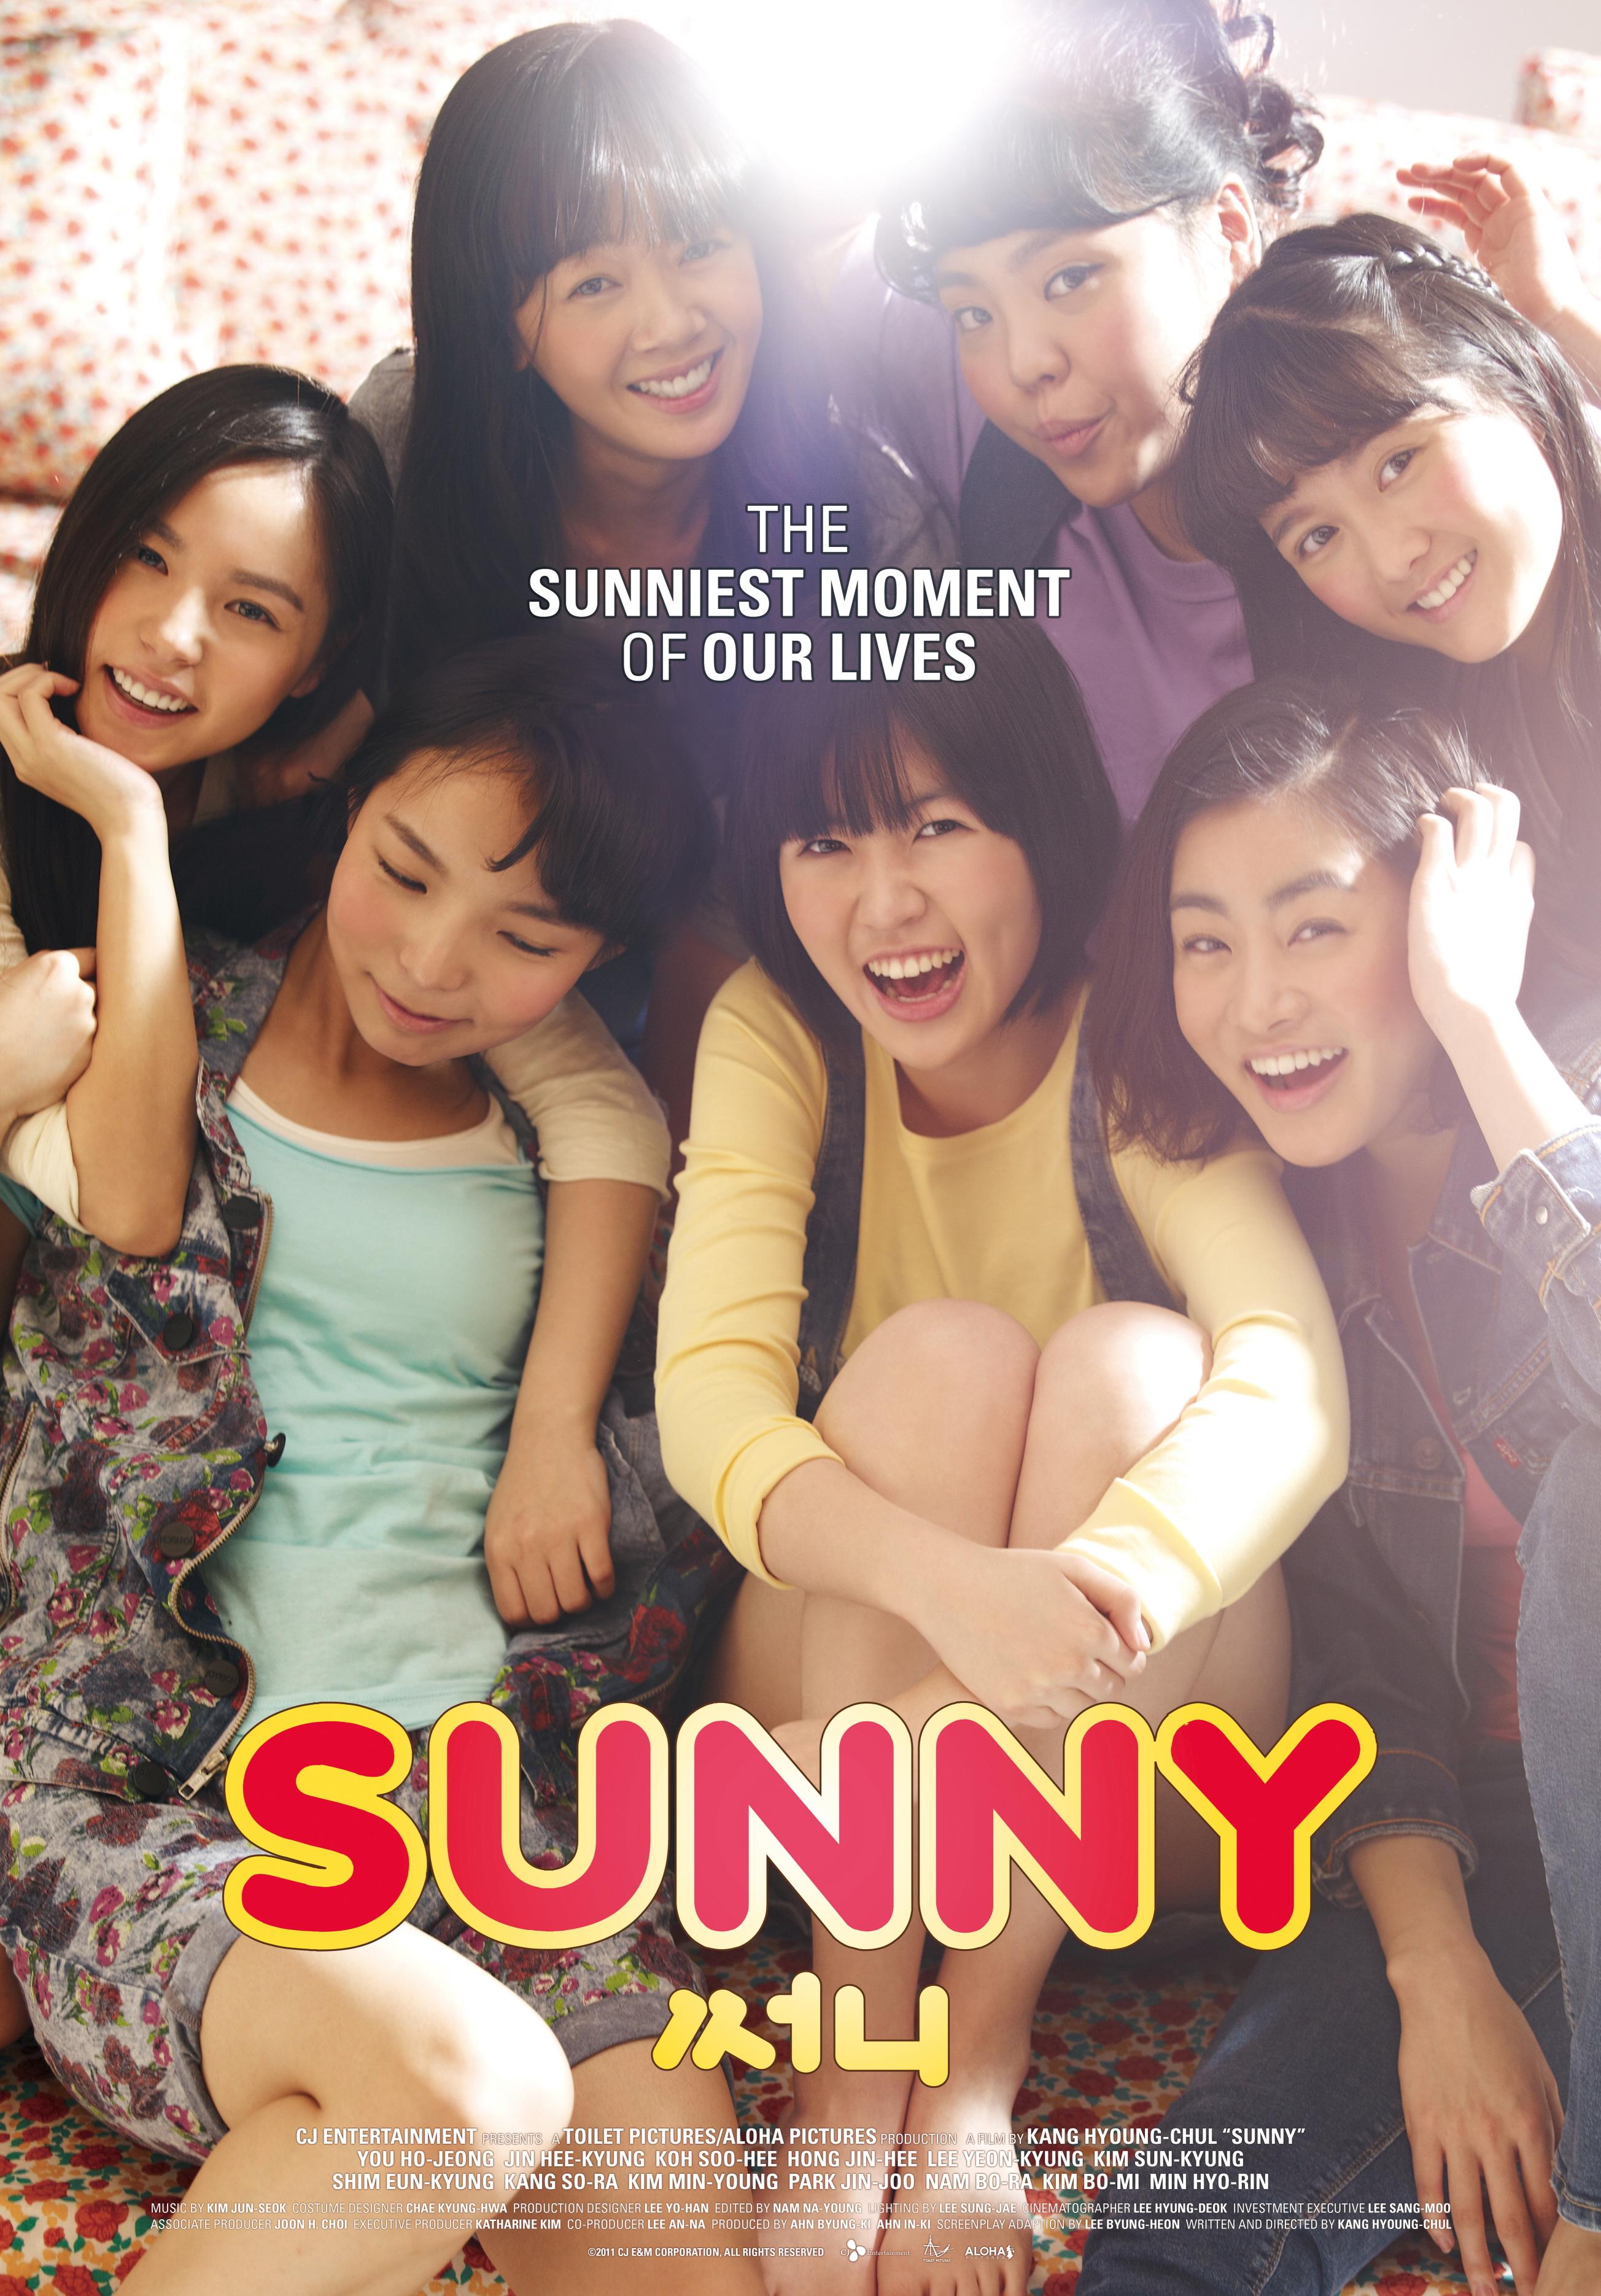 The servant korean movie sex scene